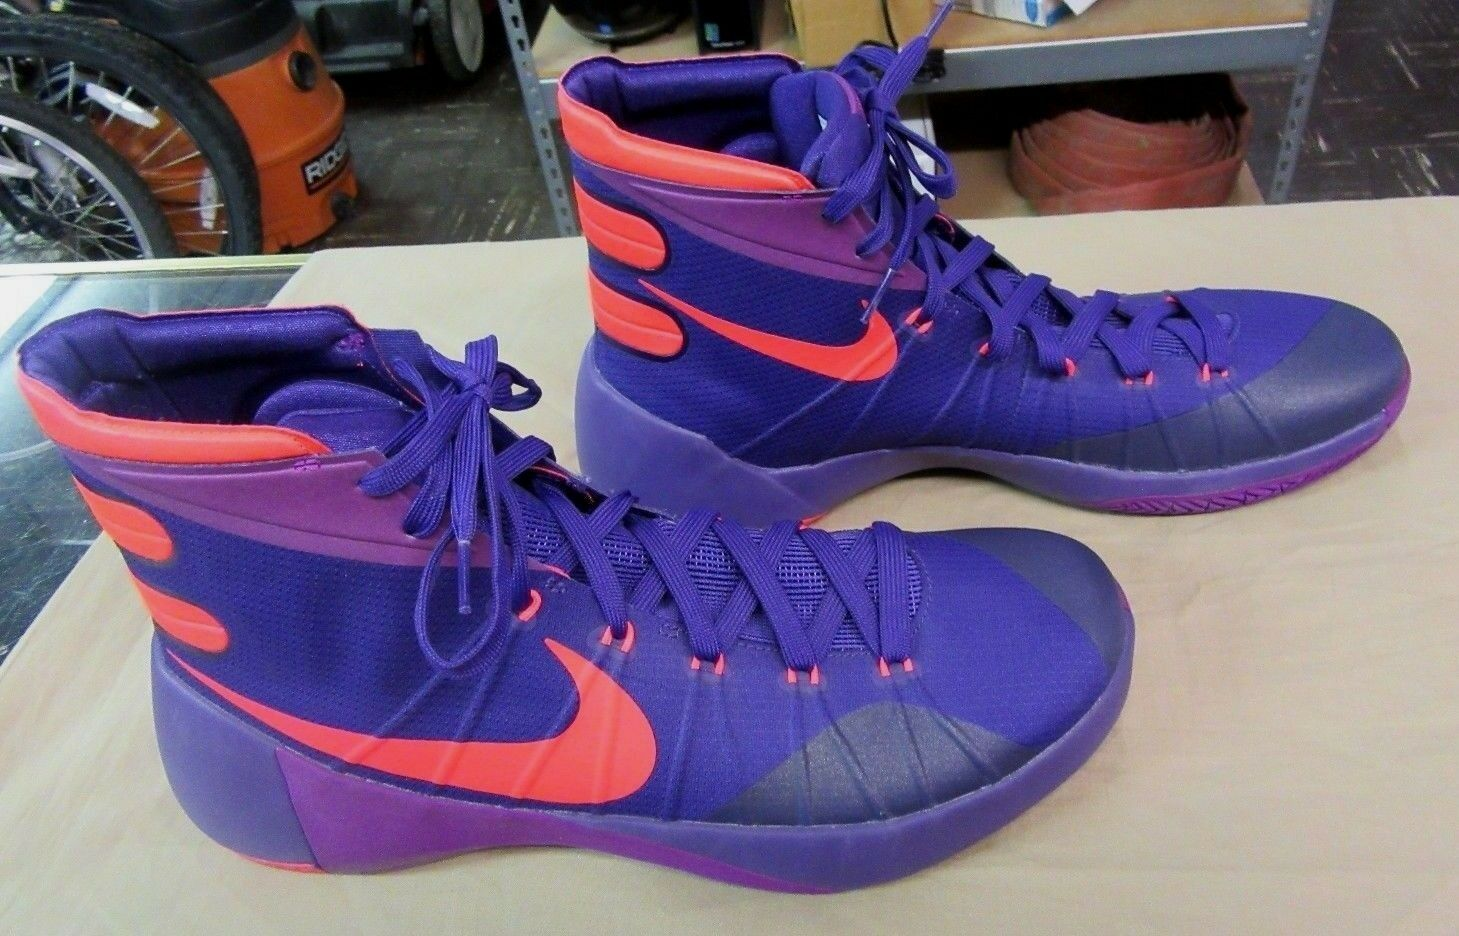 Molto gentile hyperdunk nike 749561 565 2015 scarpe da basket 13 viola / orange numero 13 basket 8fd950